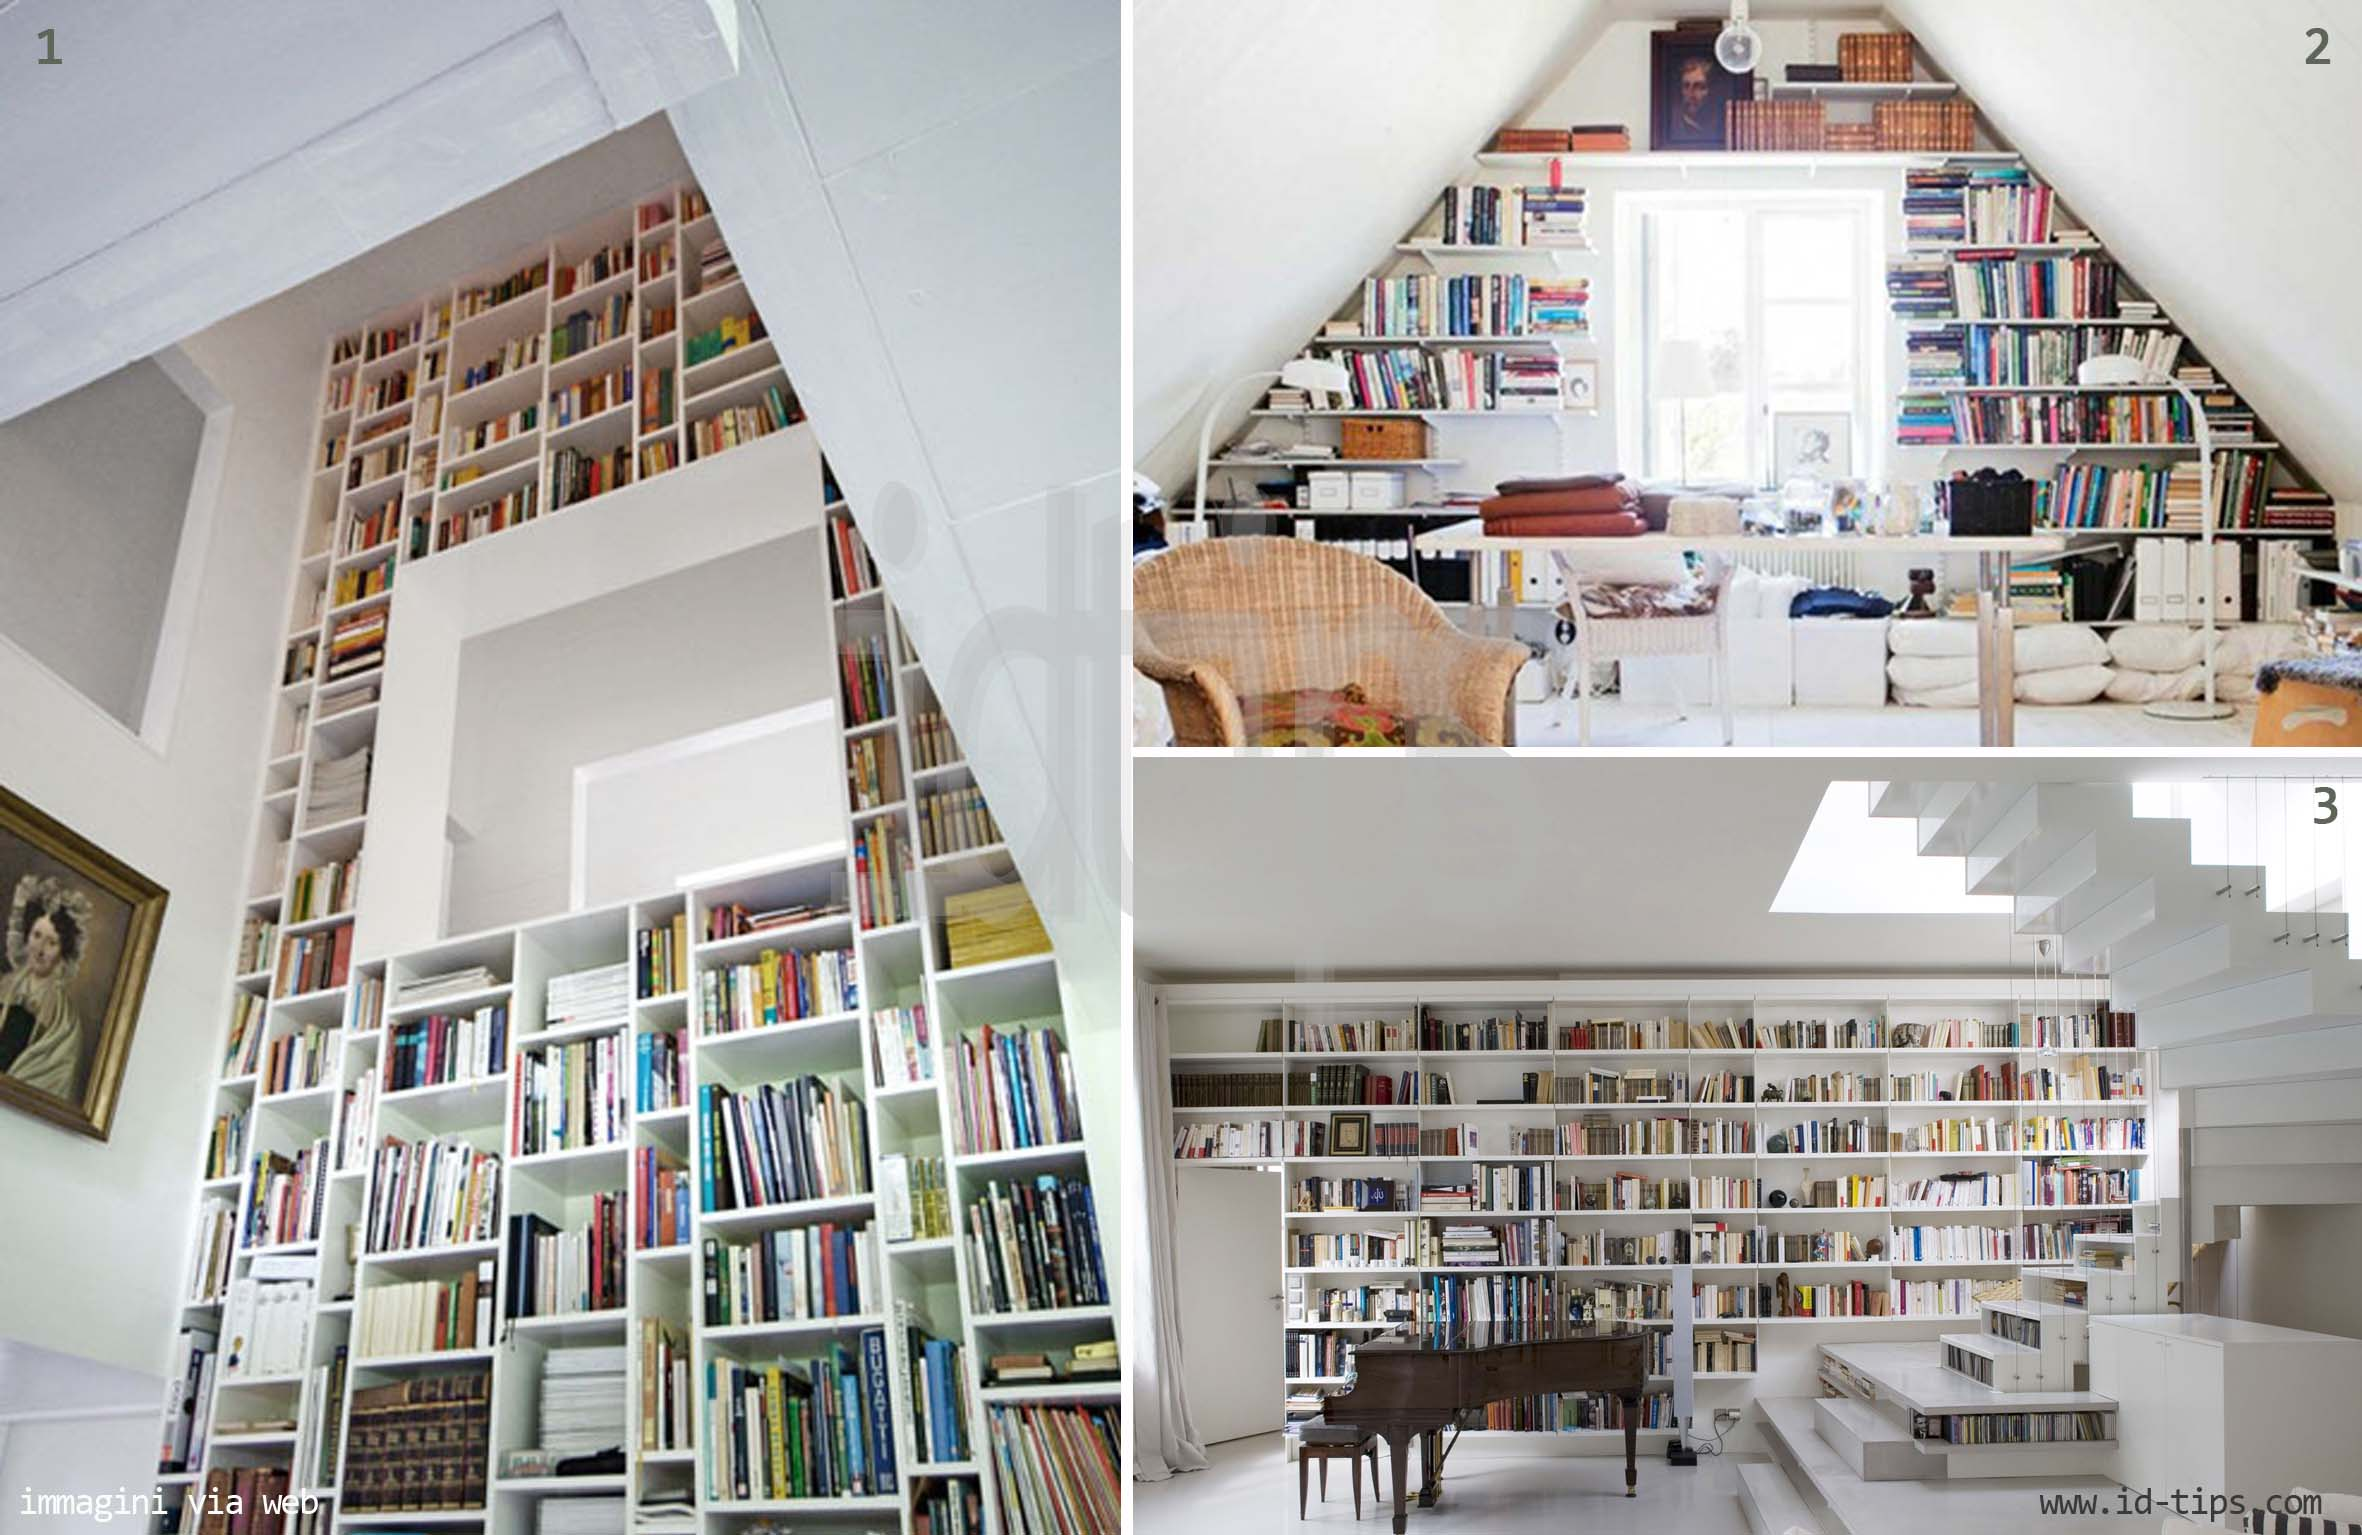 Book wall quando i libri arredano  IdTips  Interior Design Tips Blog